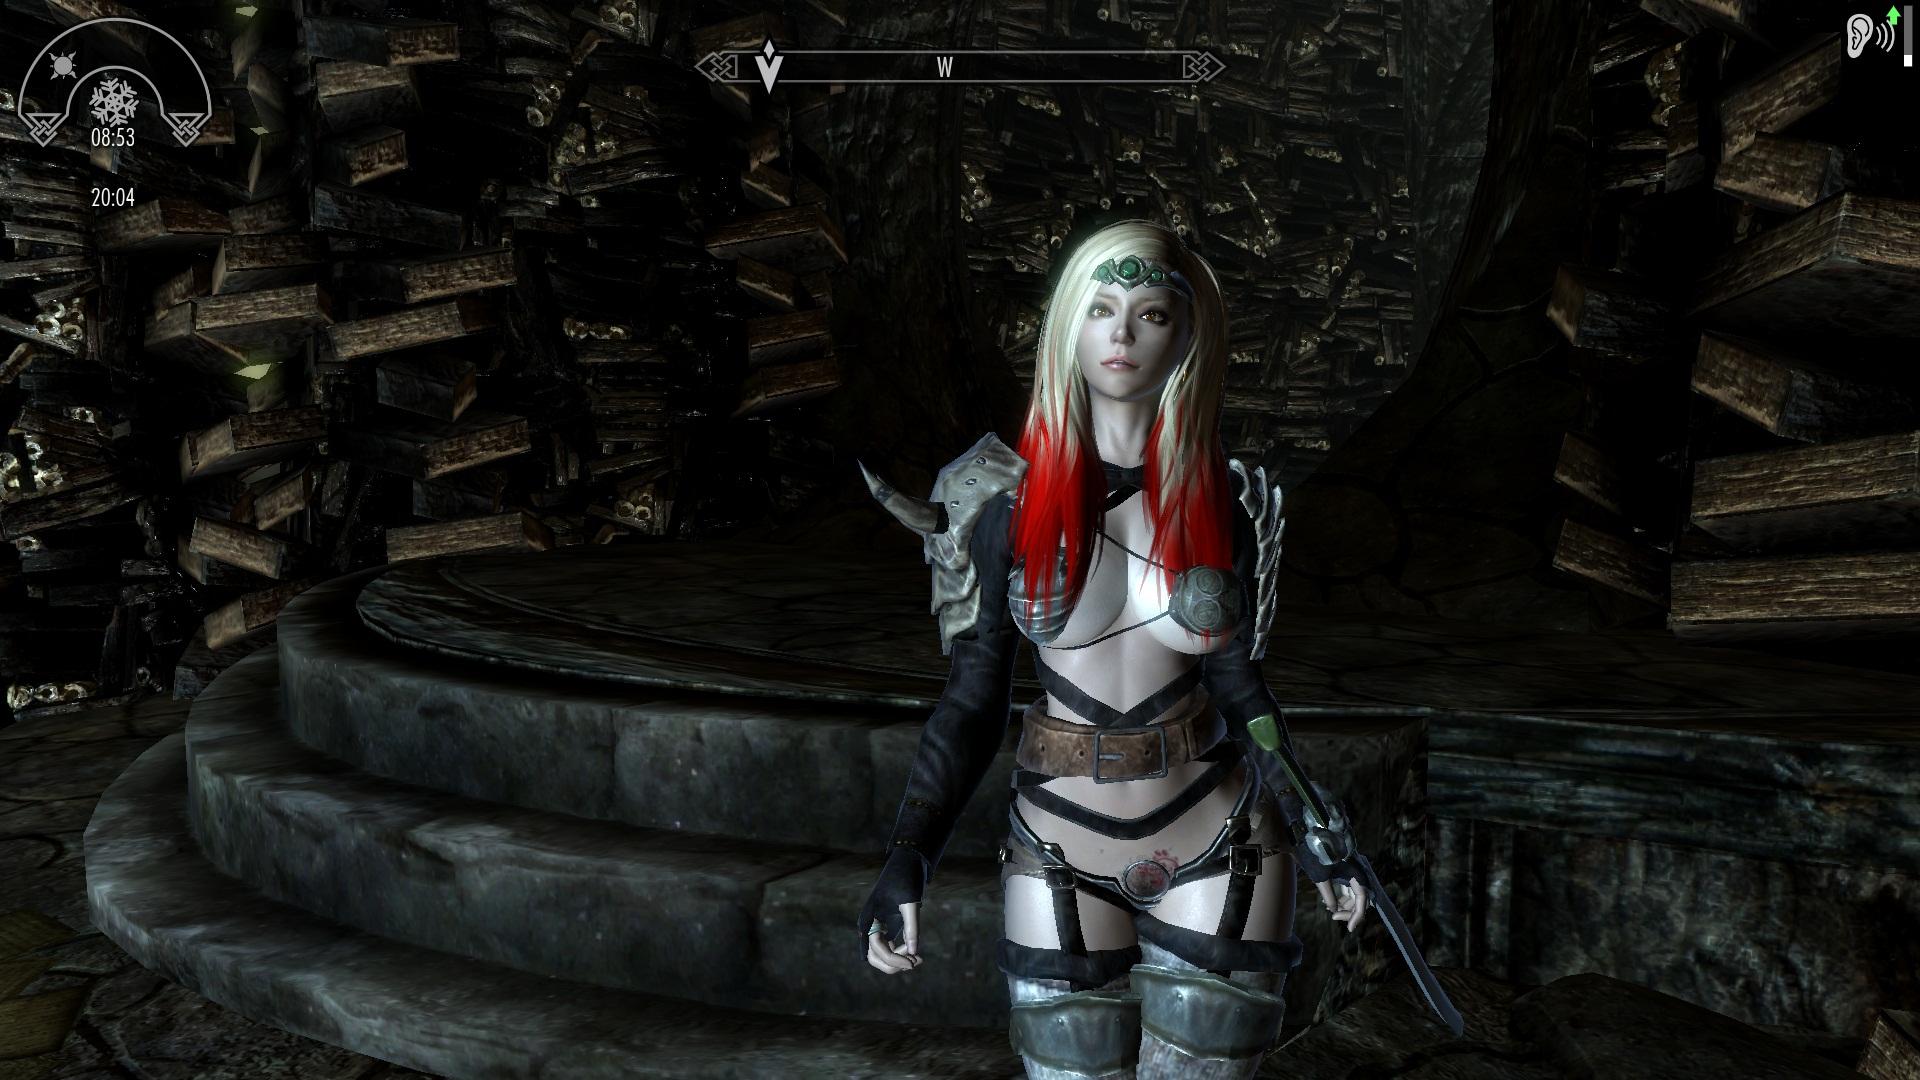 ScreenShot9.jpg - Elder Scrolls 5: Skyrim, the